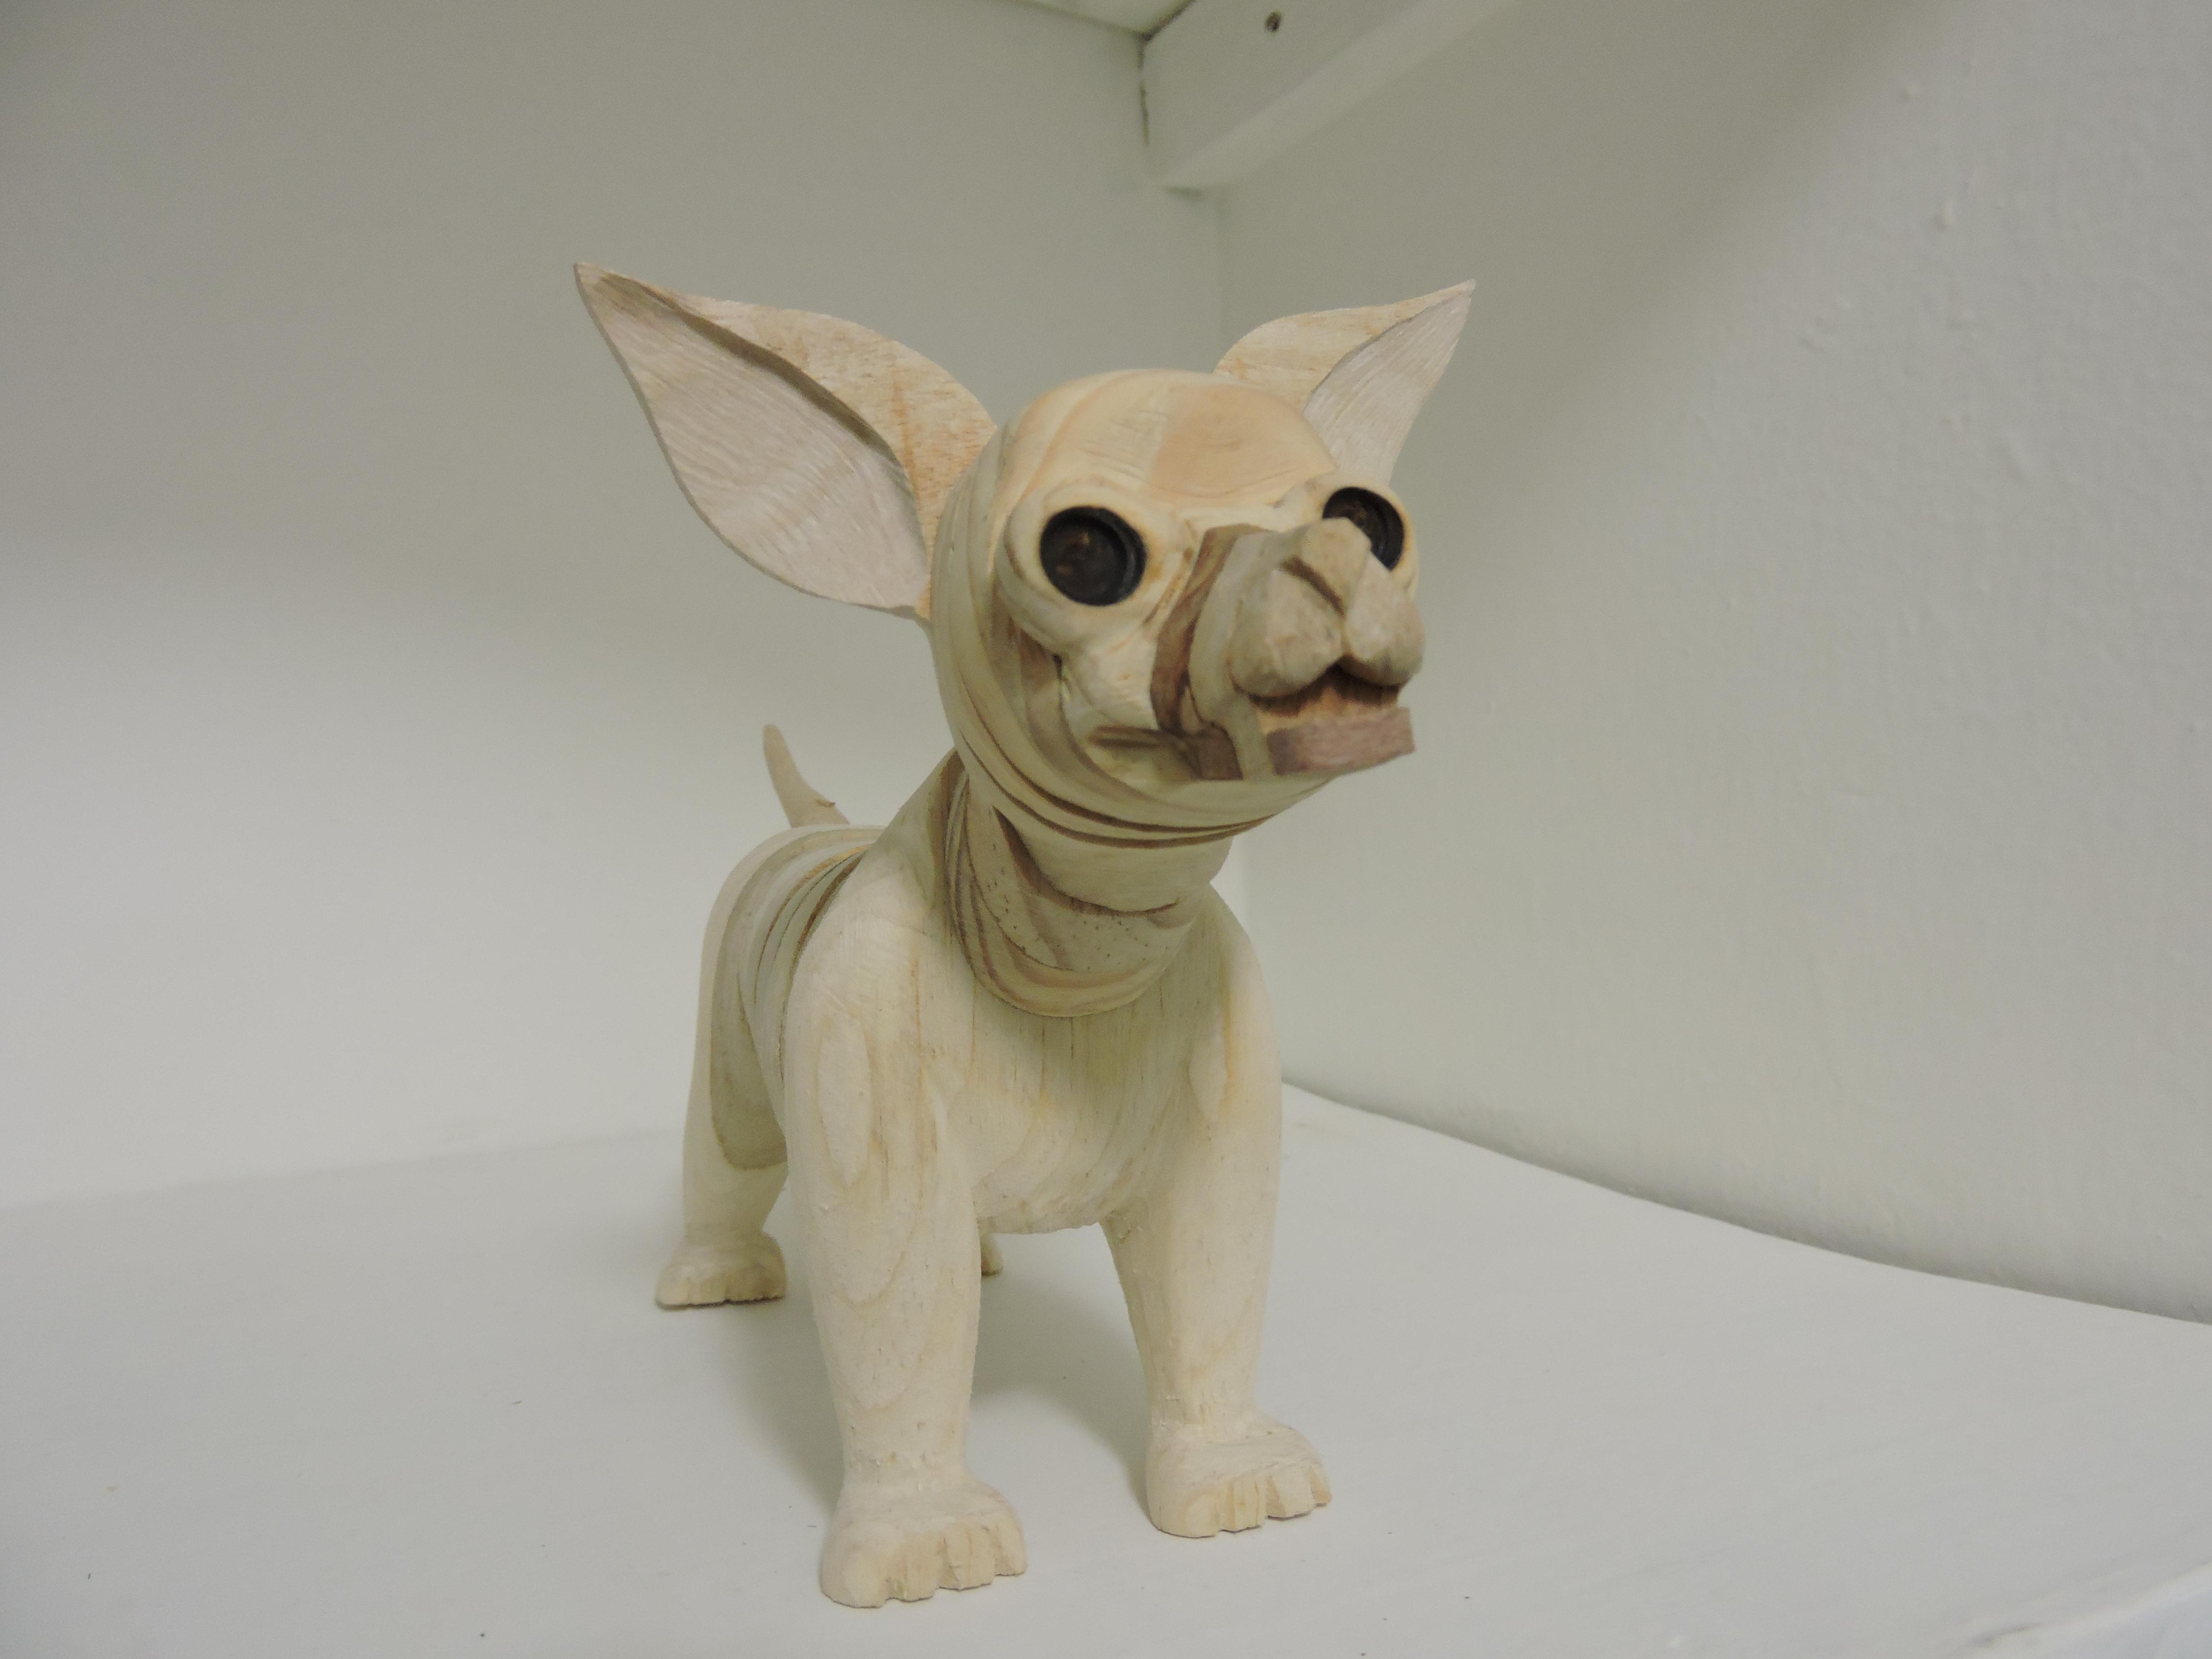 Chihuahua de Madera Artesanal OFERTA